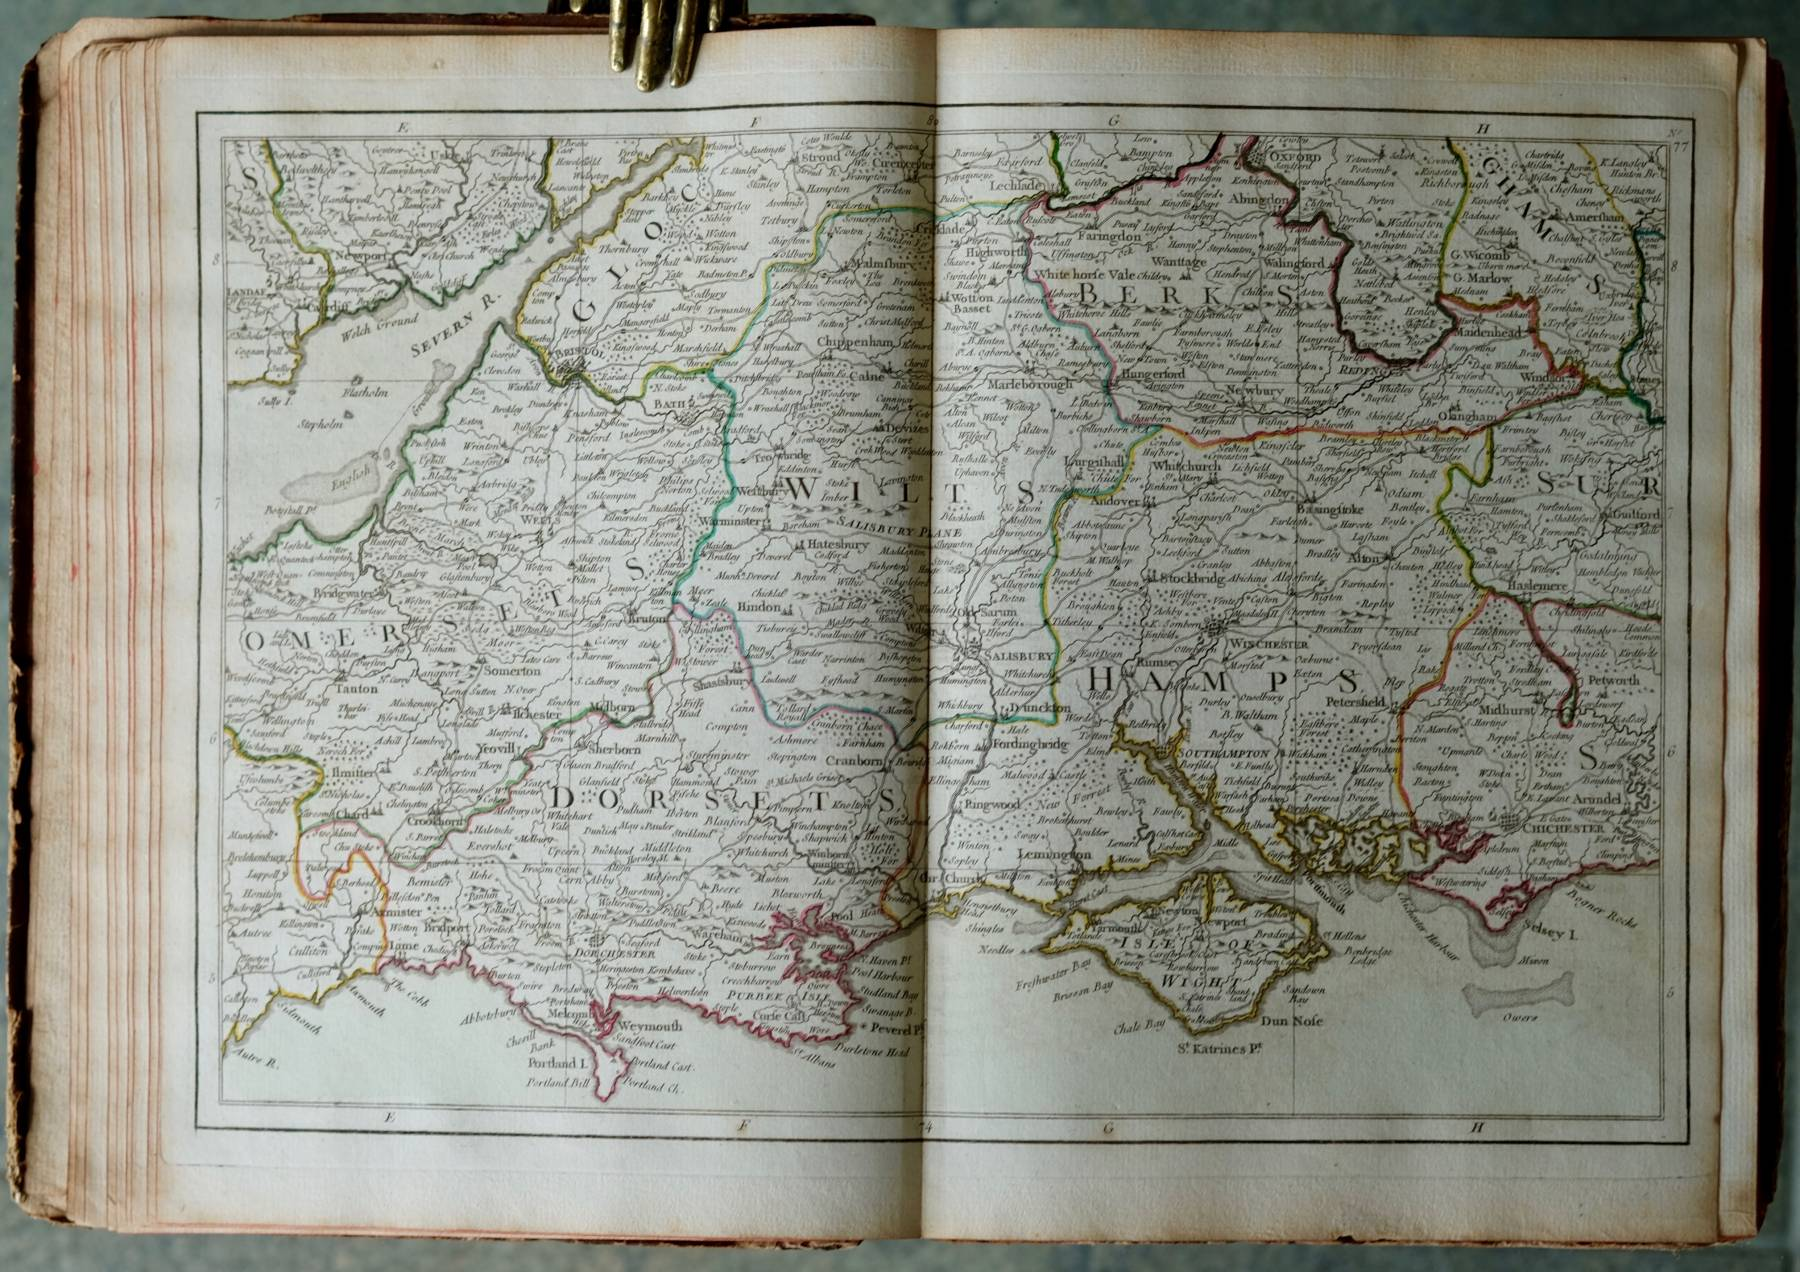 Desnos. Atlas de l'Angleterre.